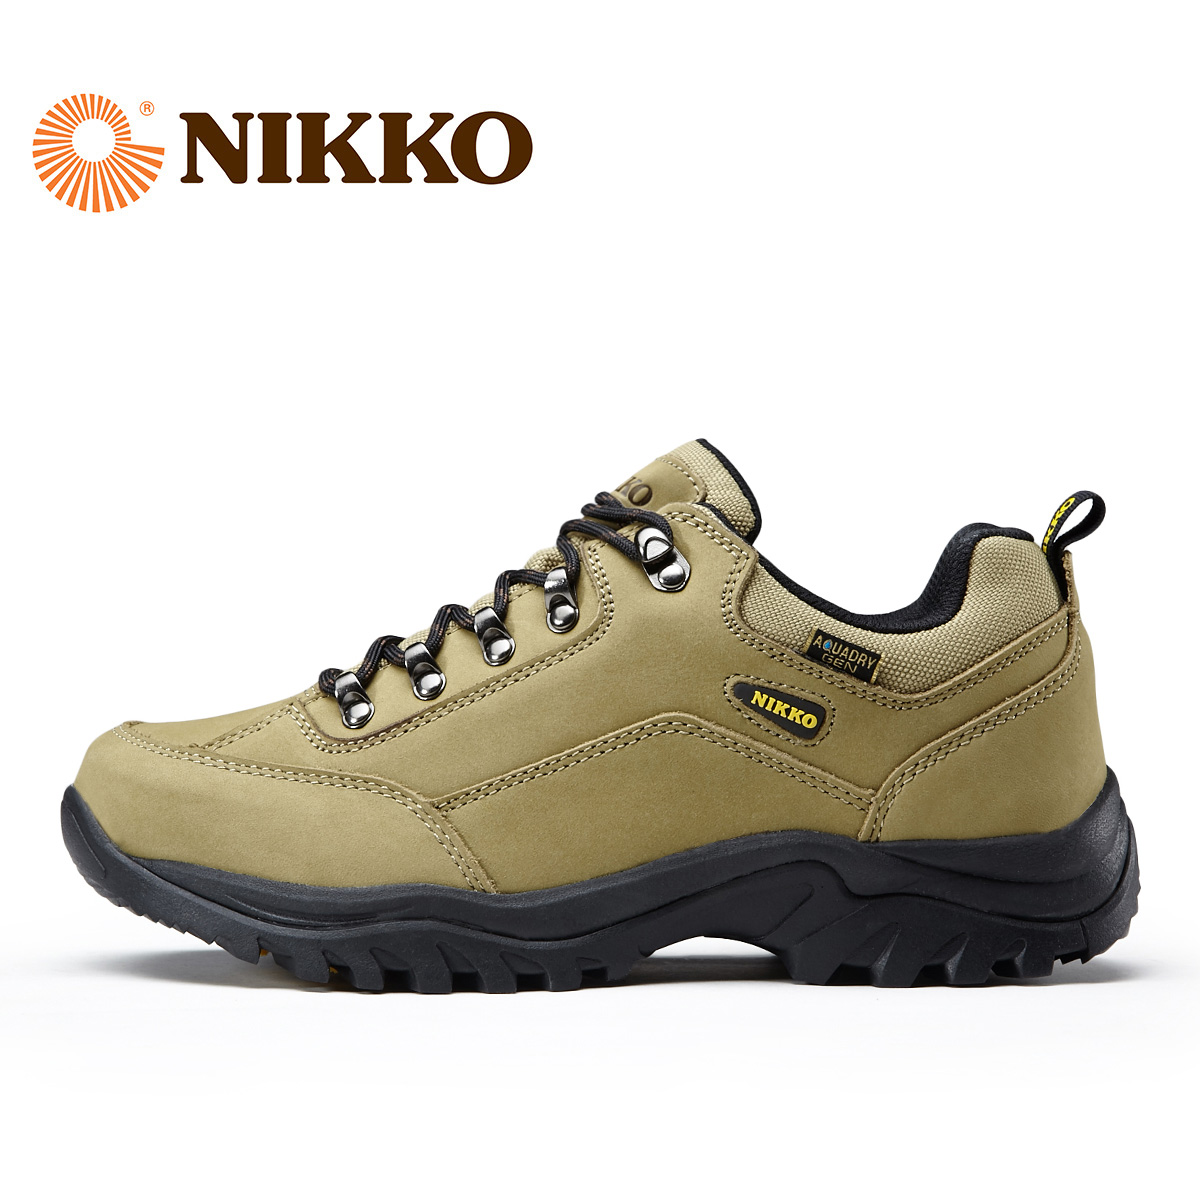 Nikko日高登山鞋男运动鞋防水户外男鞋头层牛皮徒步鞋耐磨户外鞋